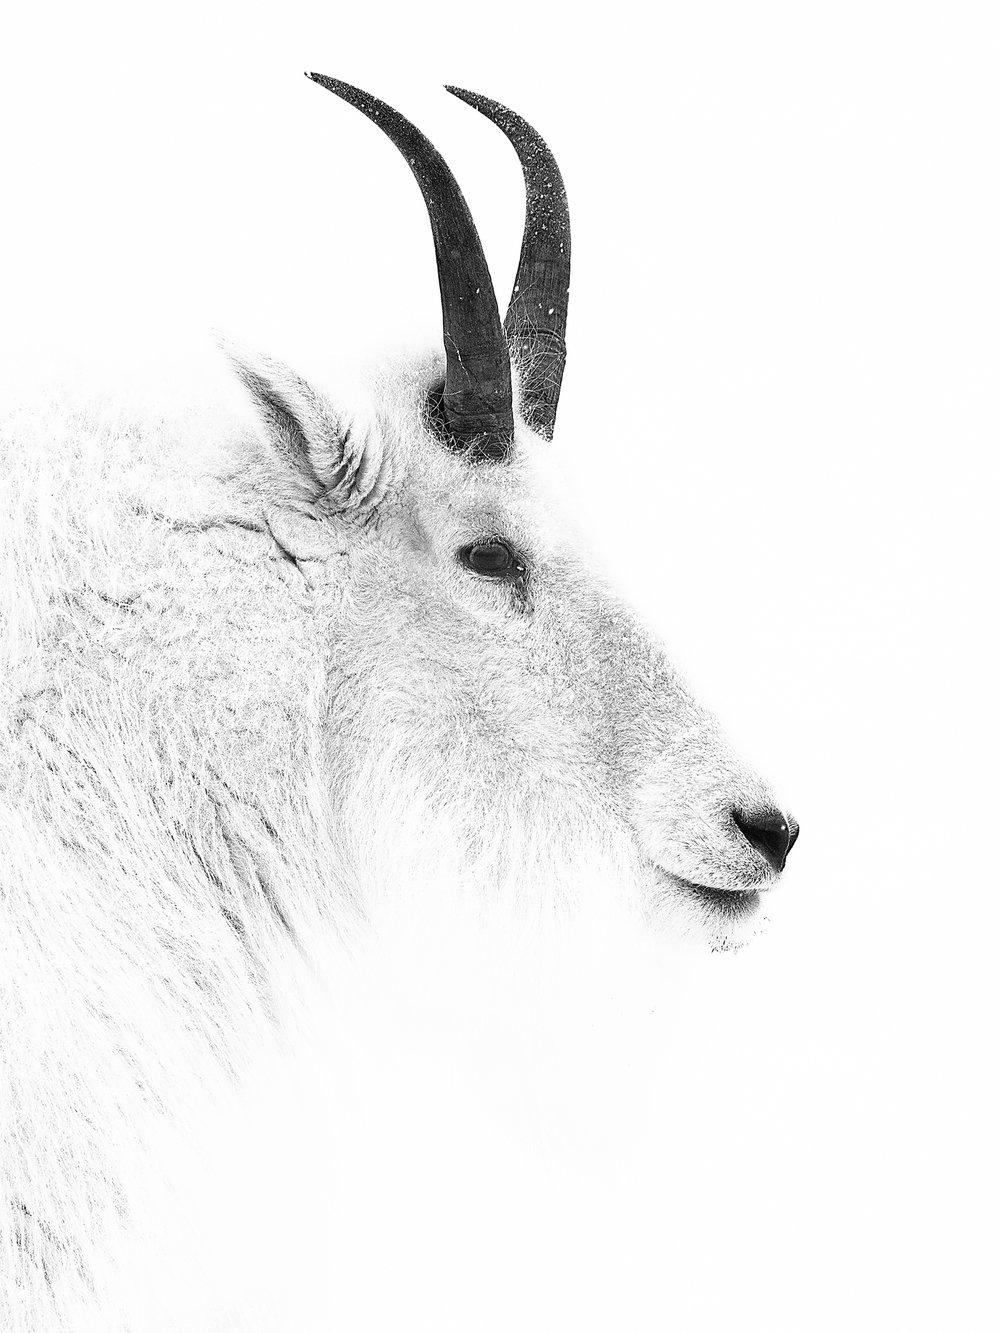 black+and+white+goat+portrait.jpg